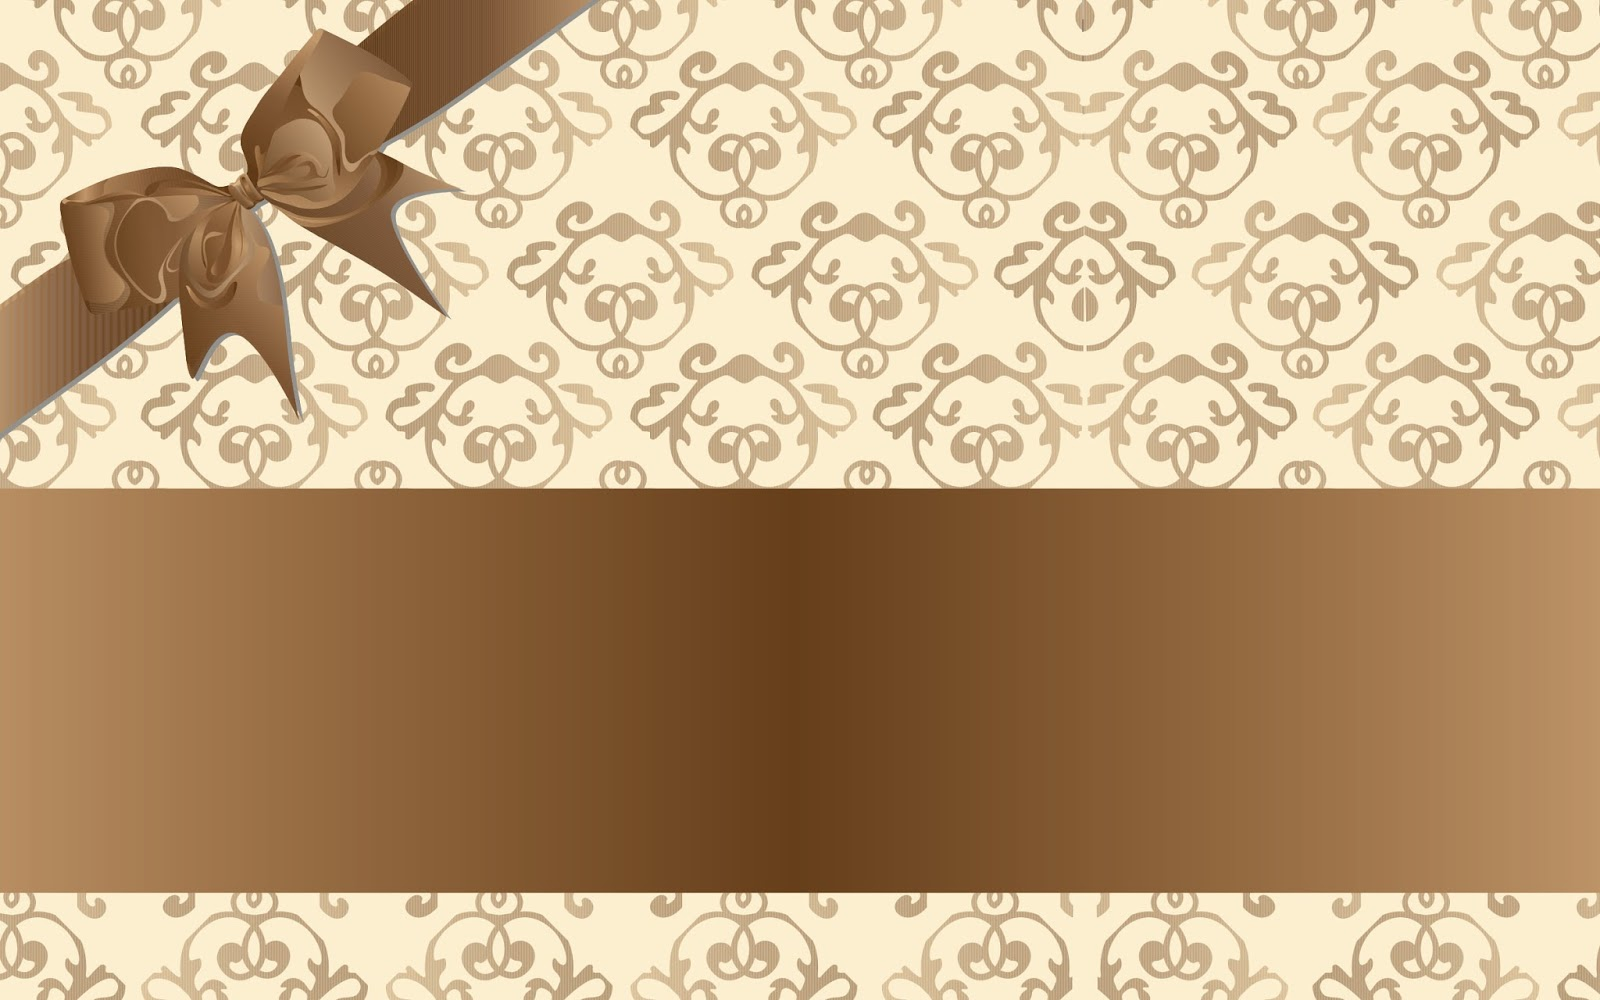 Invitation Card Design A4a3